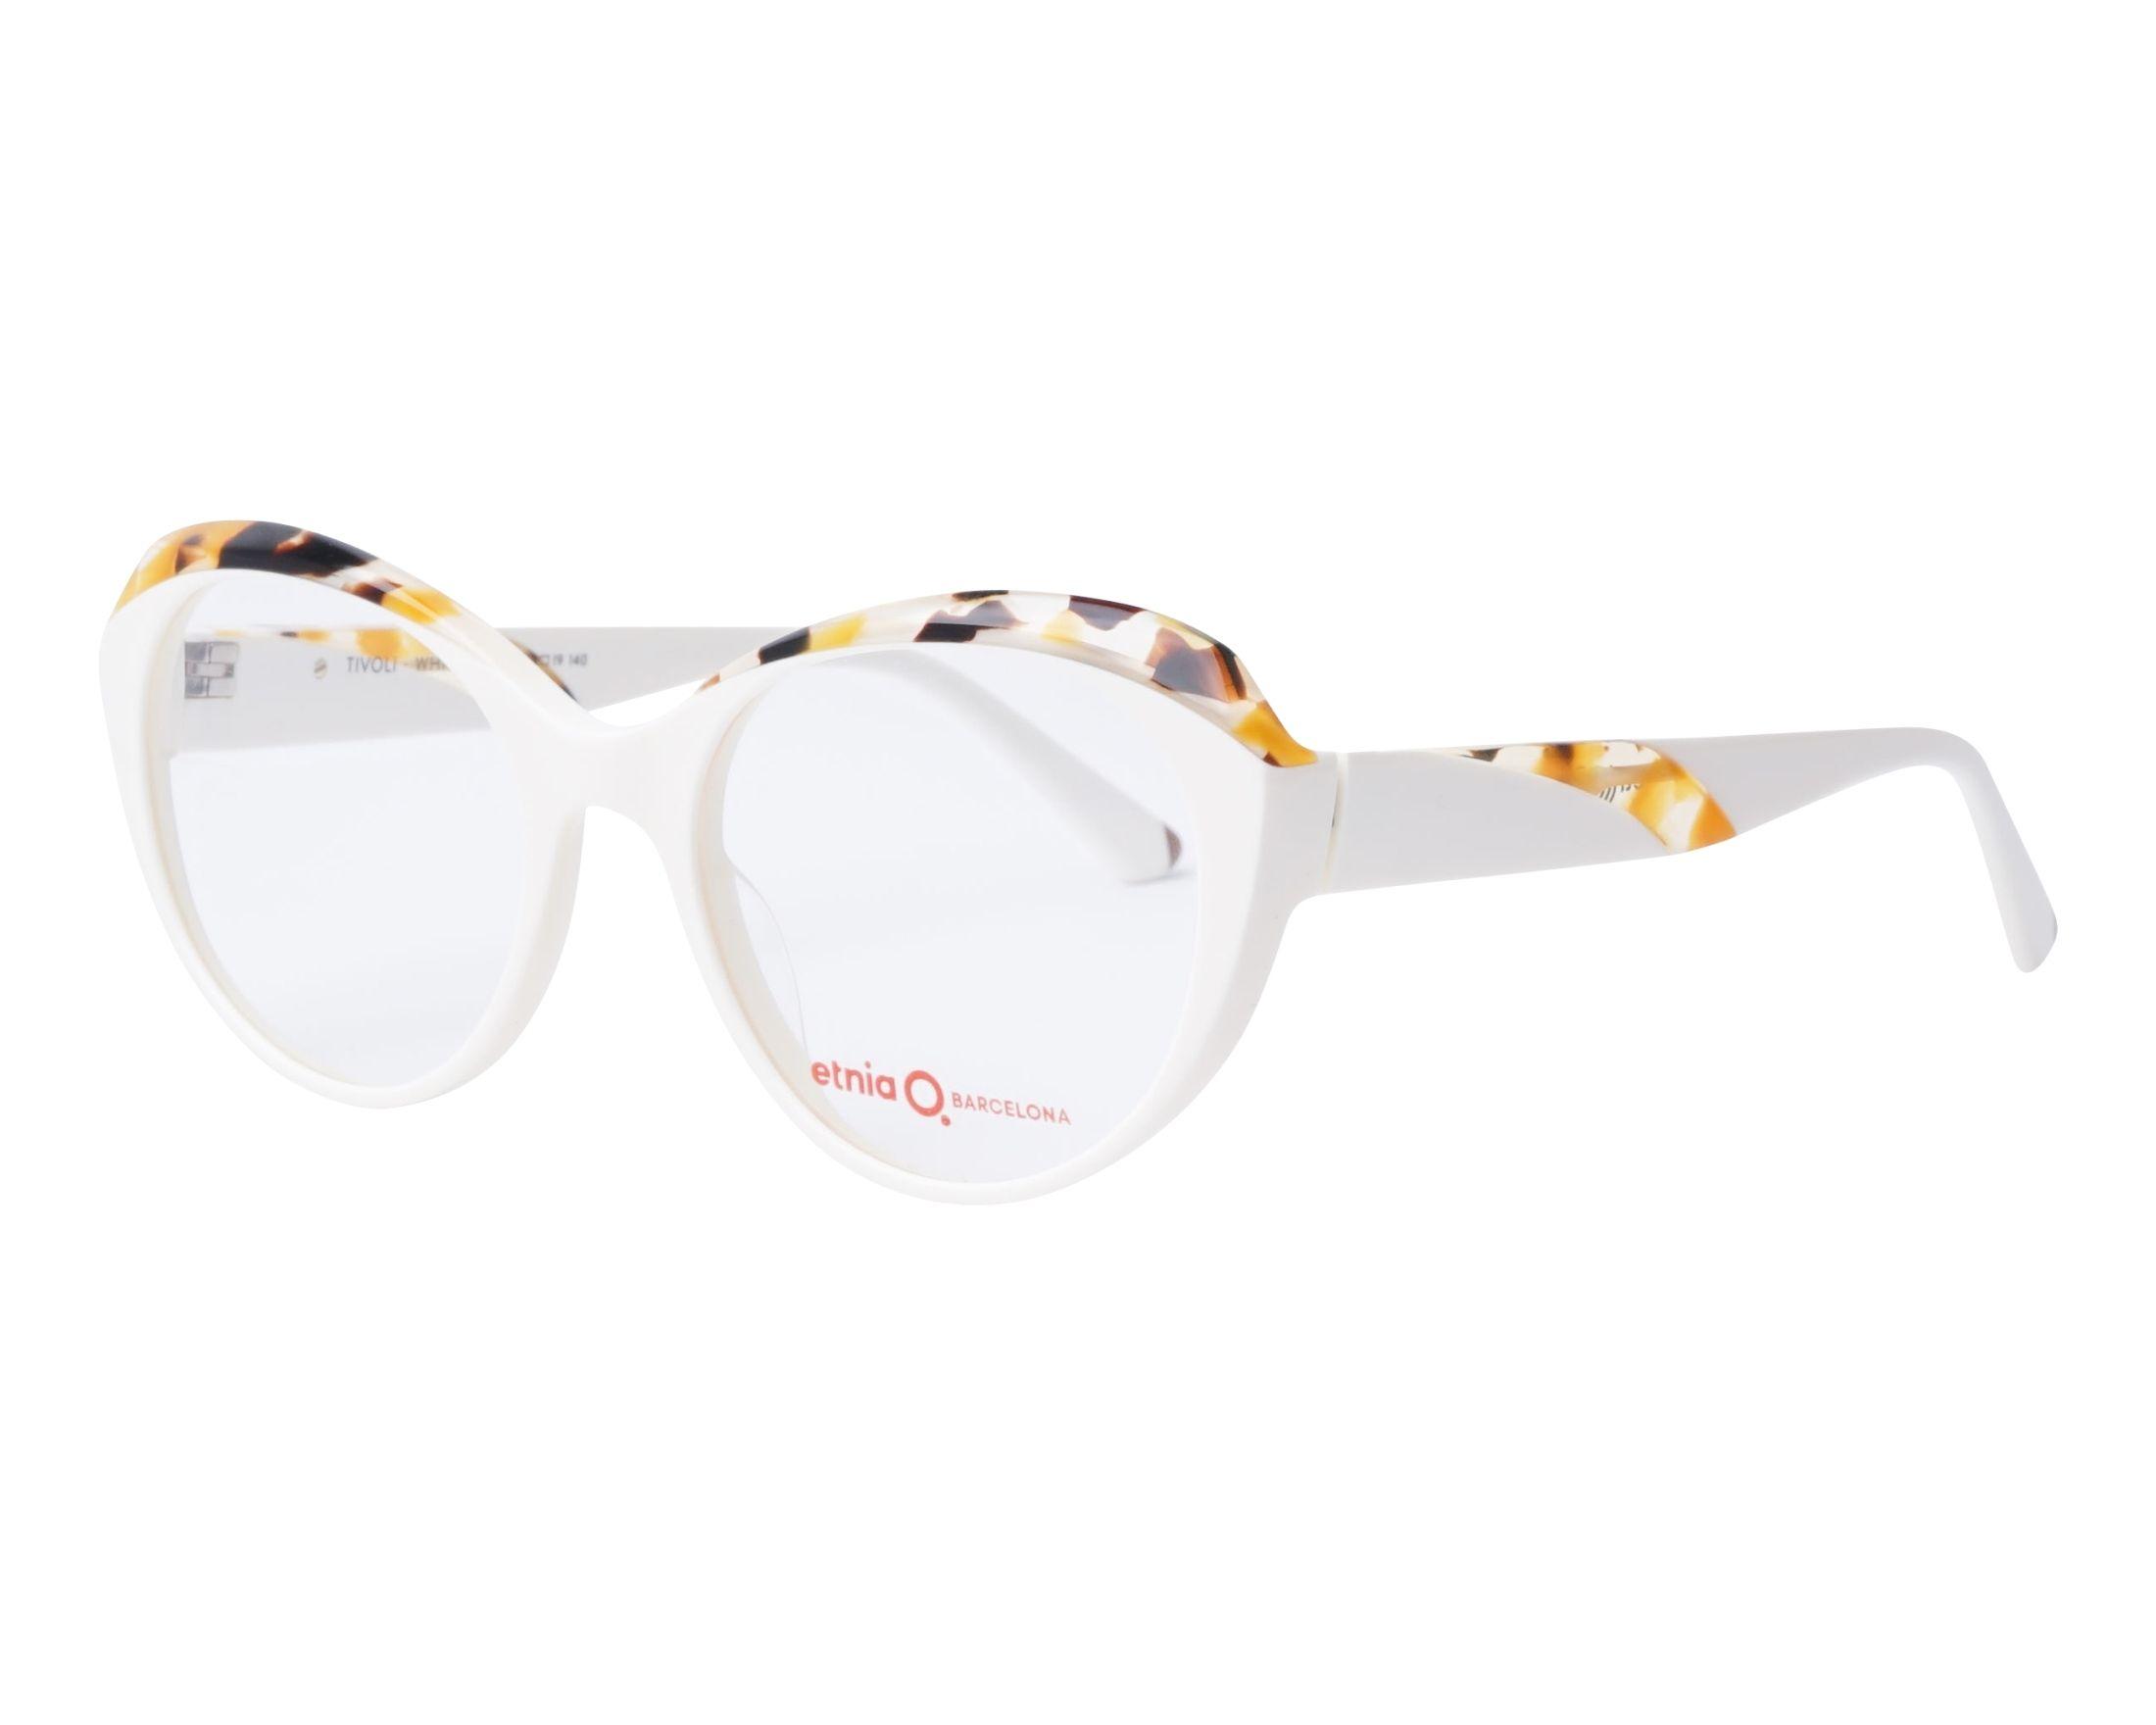 6ecf52d2c05 eyeglasses Etnia Barcelona TIVOLI WHHV - White Havana profile view